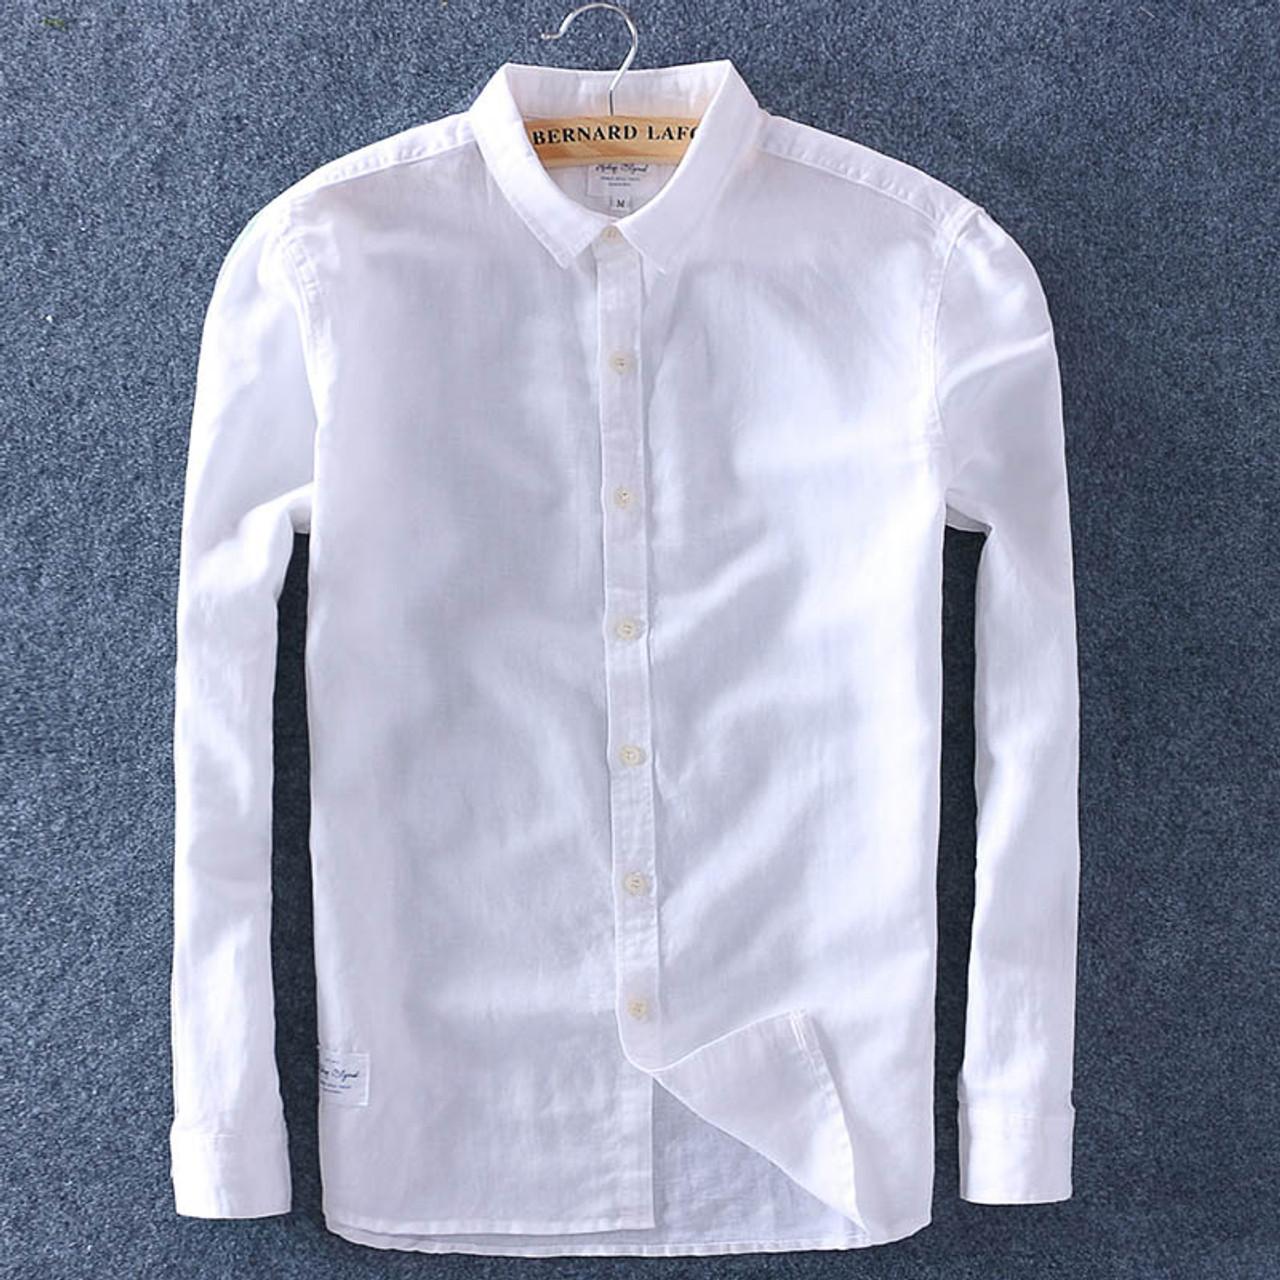 36c580b8302 ... Top Quality 2018 Men Spring Summer Cotton Linen Shirt Slim Square  Collar Comfortable Undershirt Male Plus ...